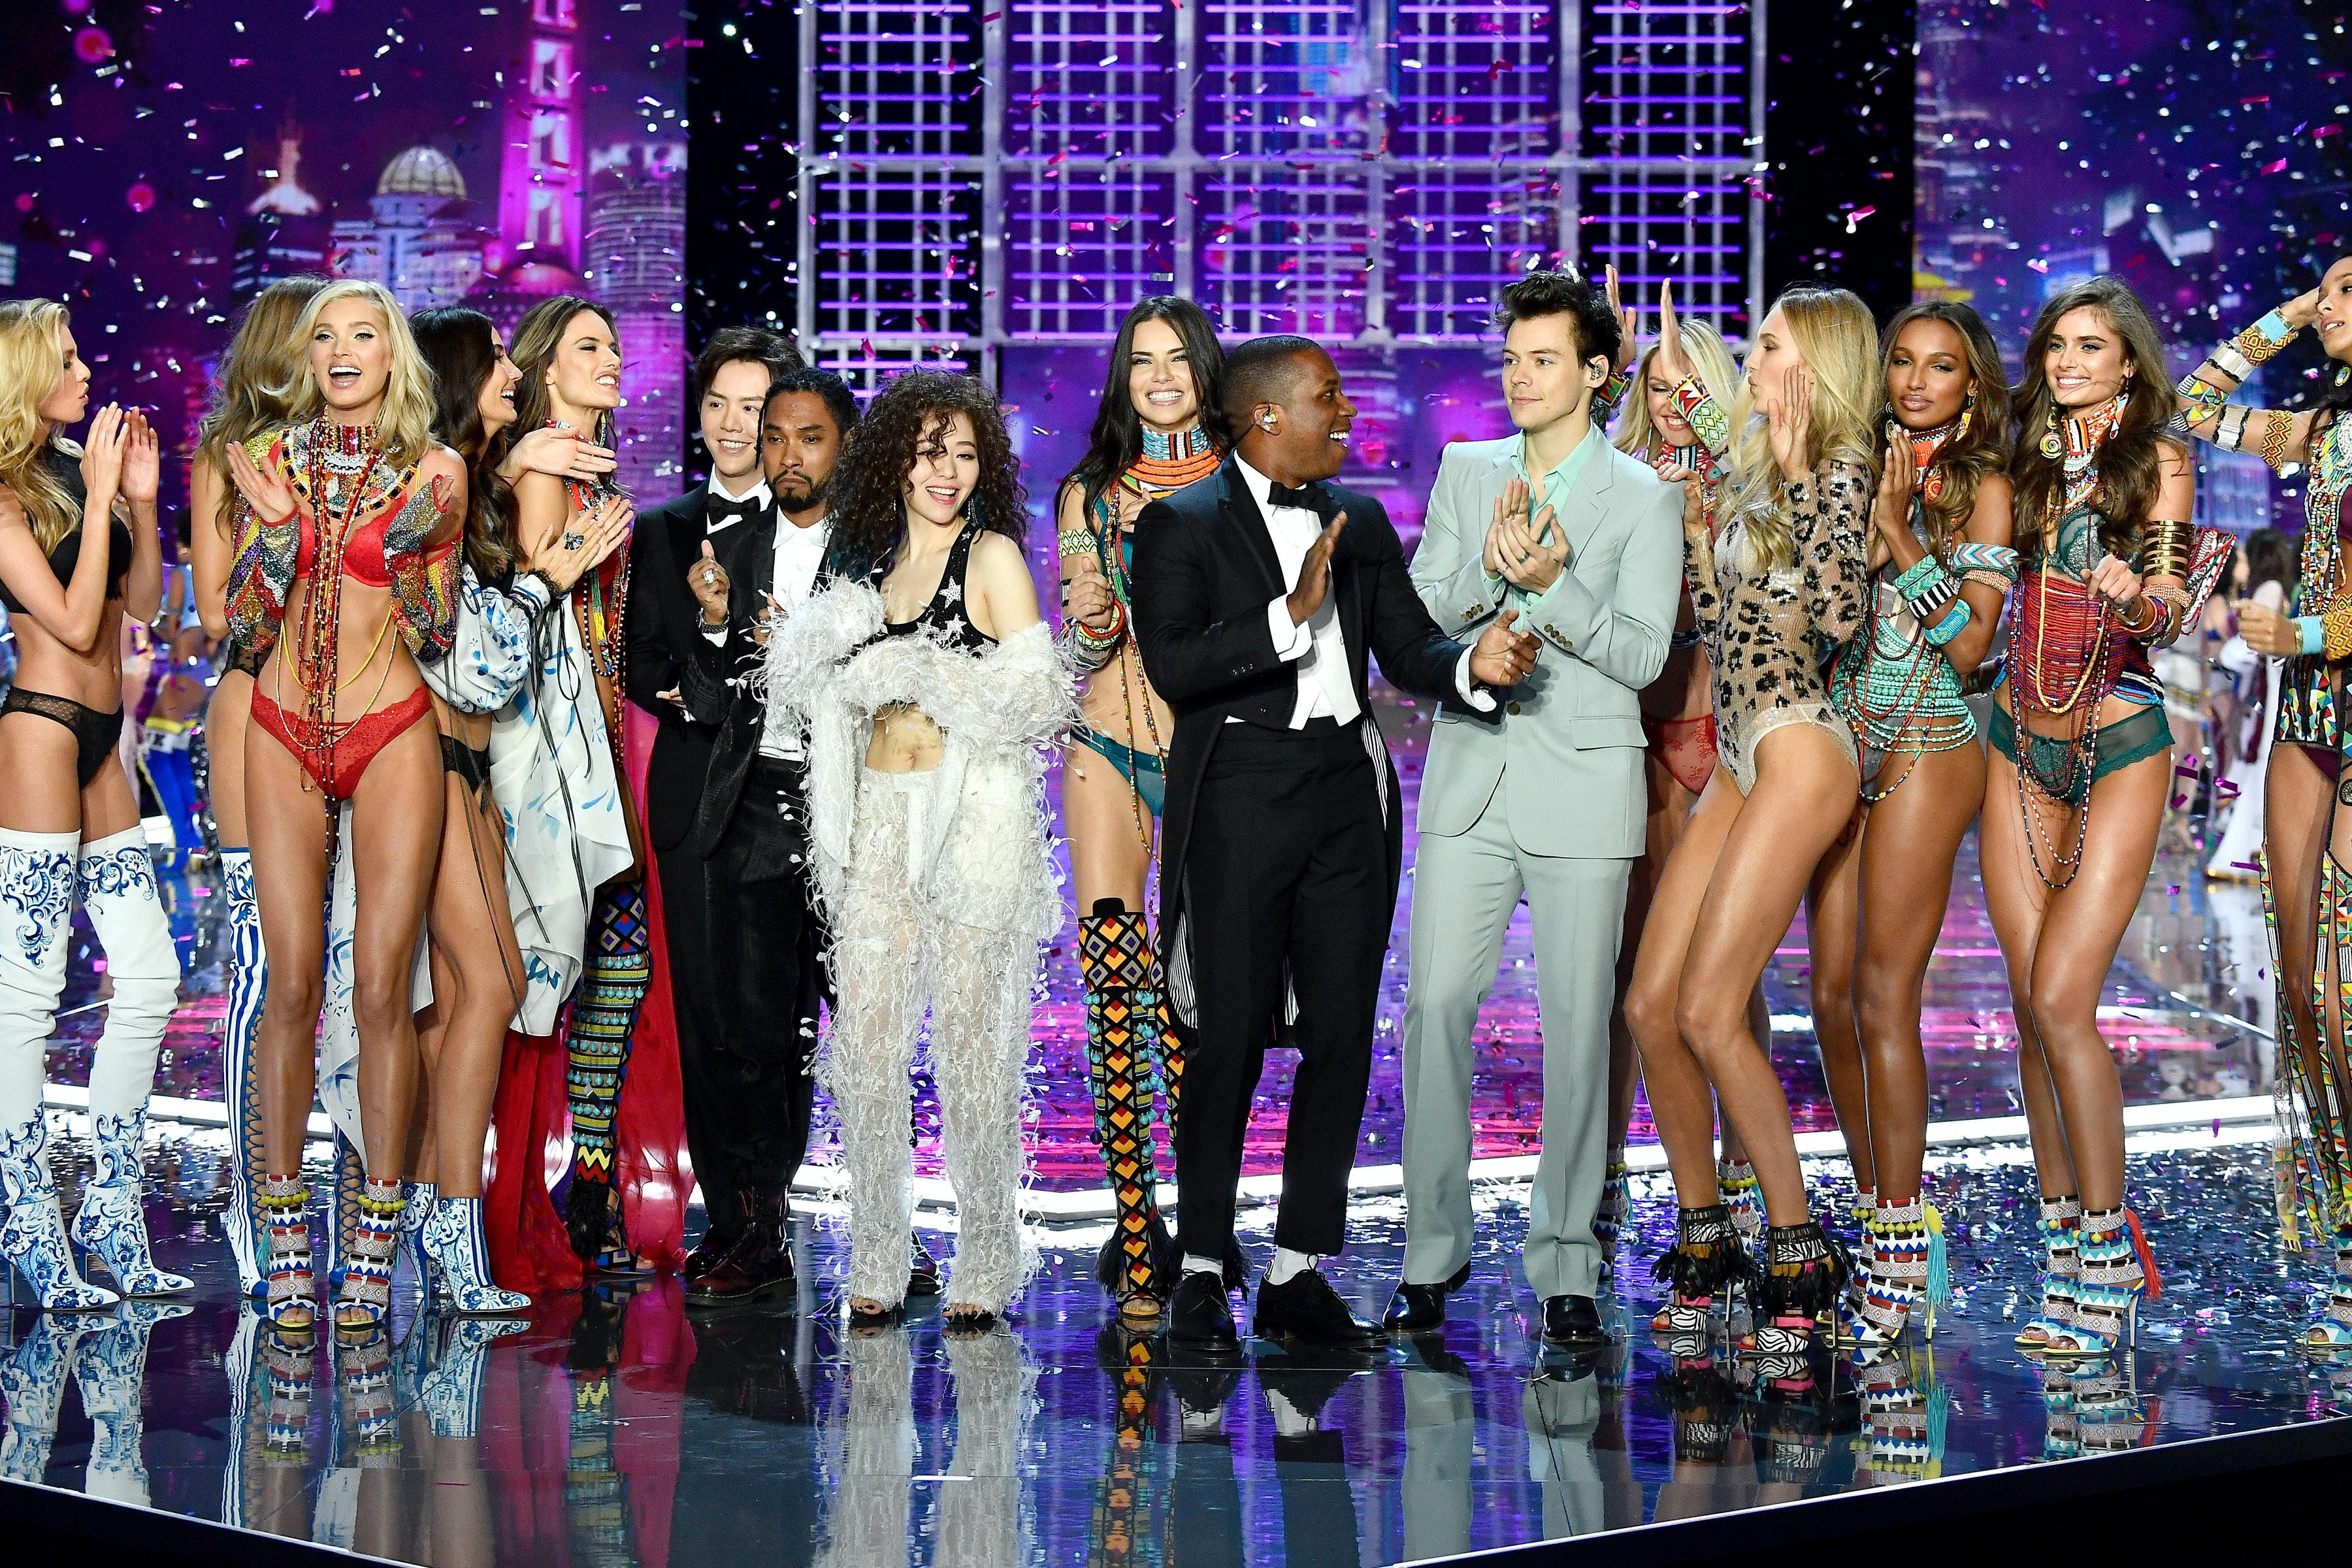 Harry Styles\u0027 Performance At The Victoria\u0027s Secret Fashion Show ...